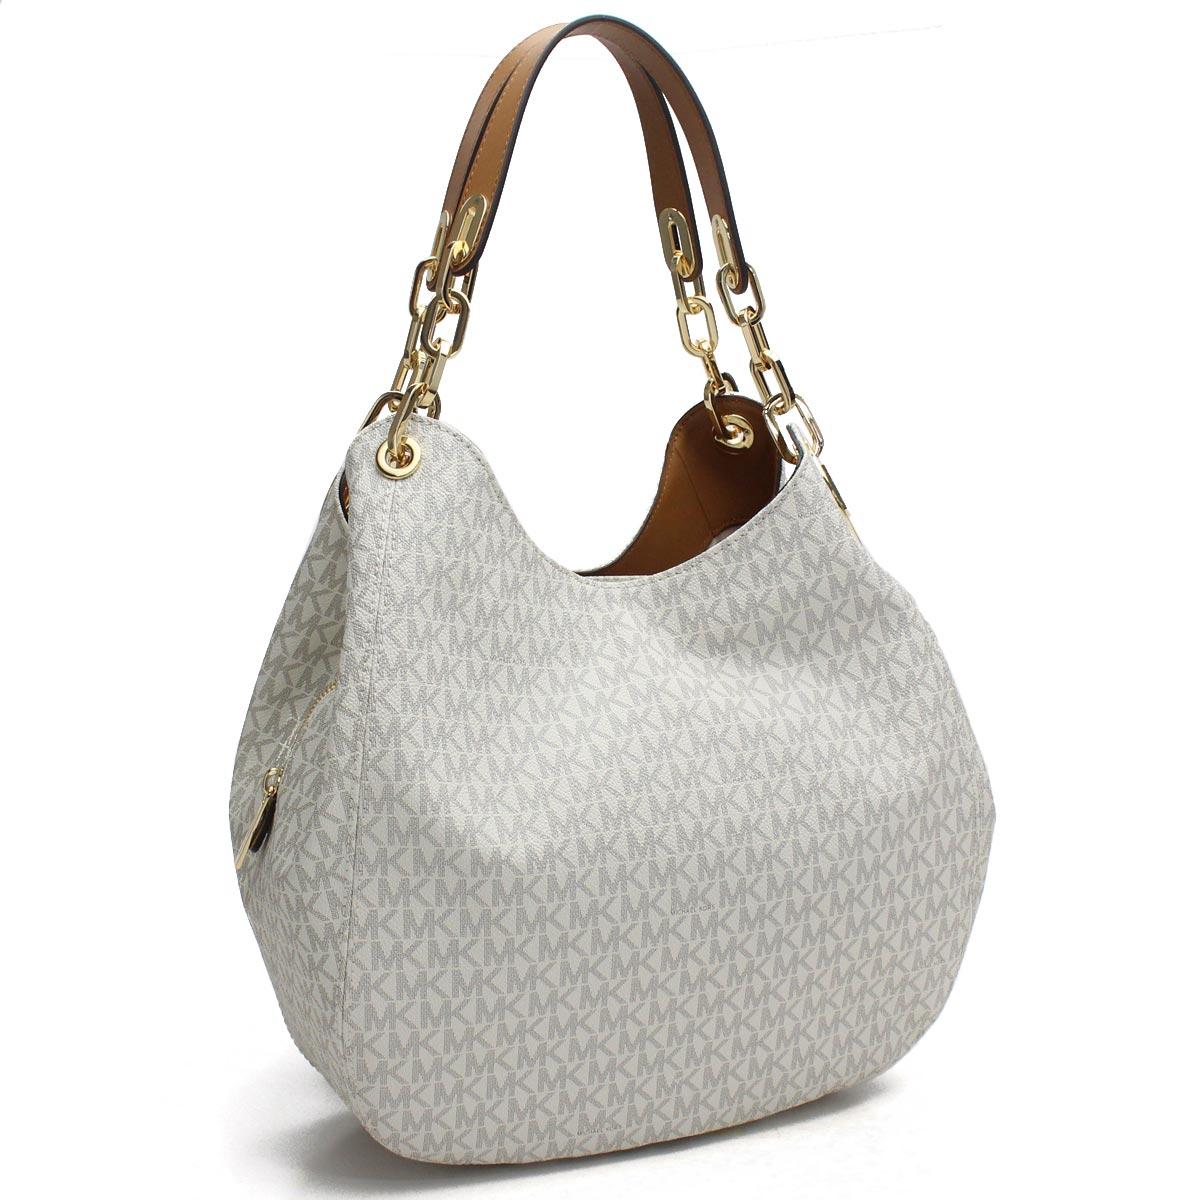 1ad3f88644cc8b Bighit The total brand wholesale: Michael Kors MICHAEL KORS FULTON Fulton  tote bag 30S7GFTL3B VANILLA white system | Rakuten Global Market